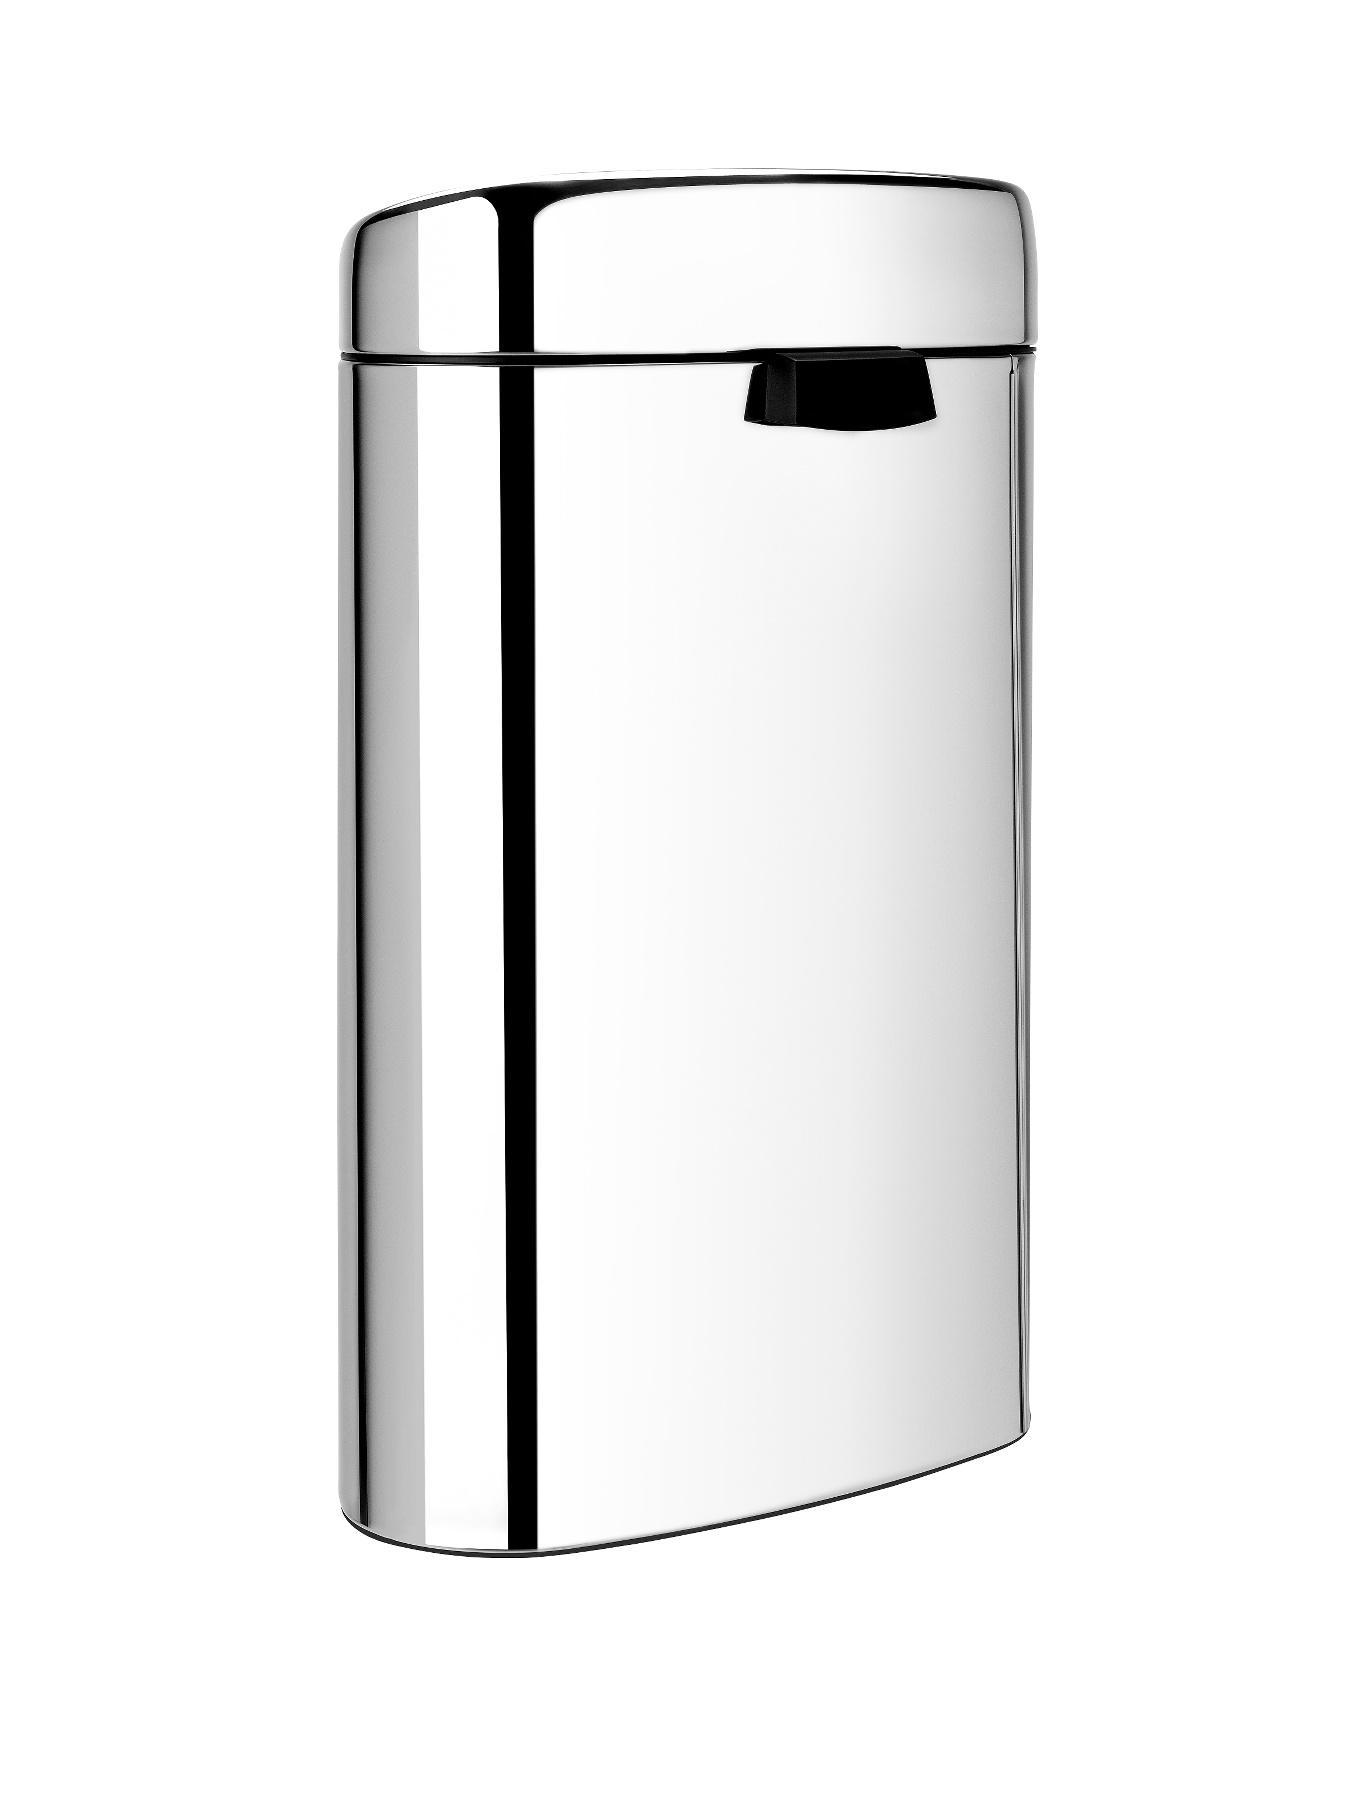 Sense Touch Bin d Shape Touch Bin 40-litre